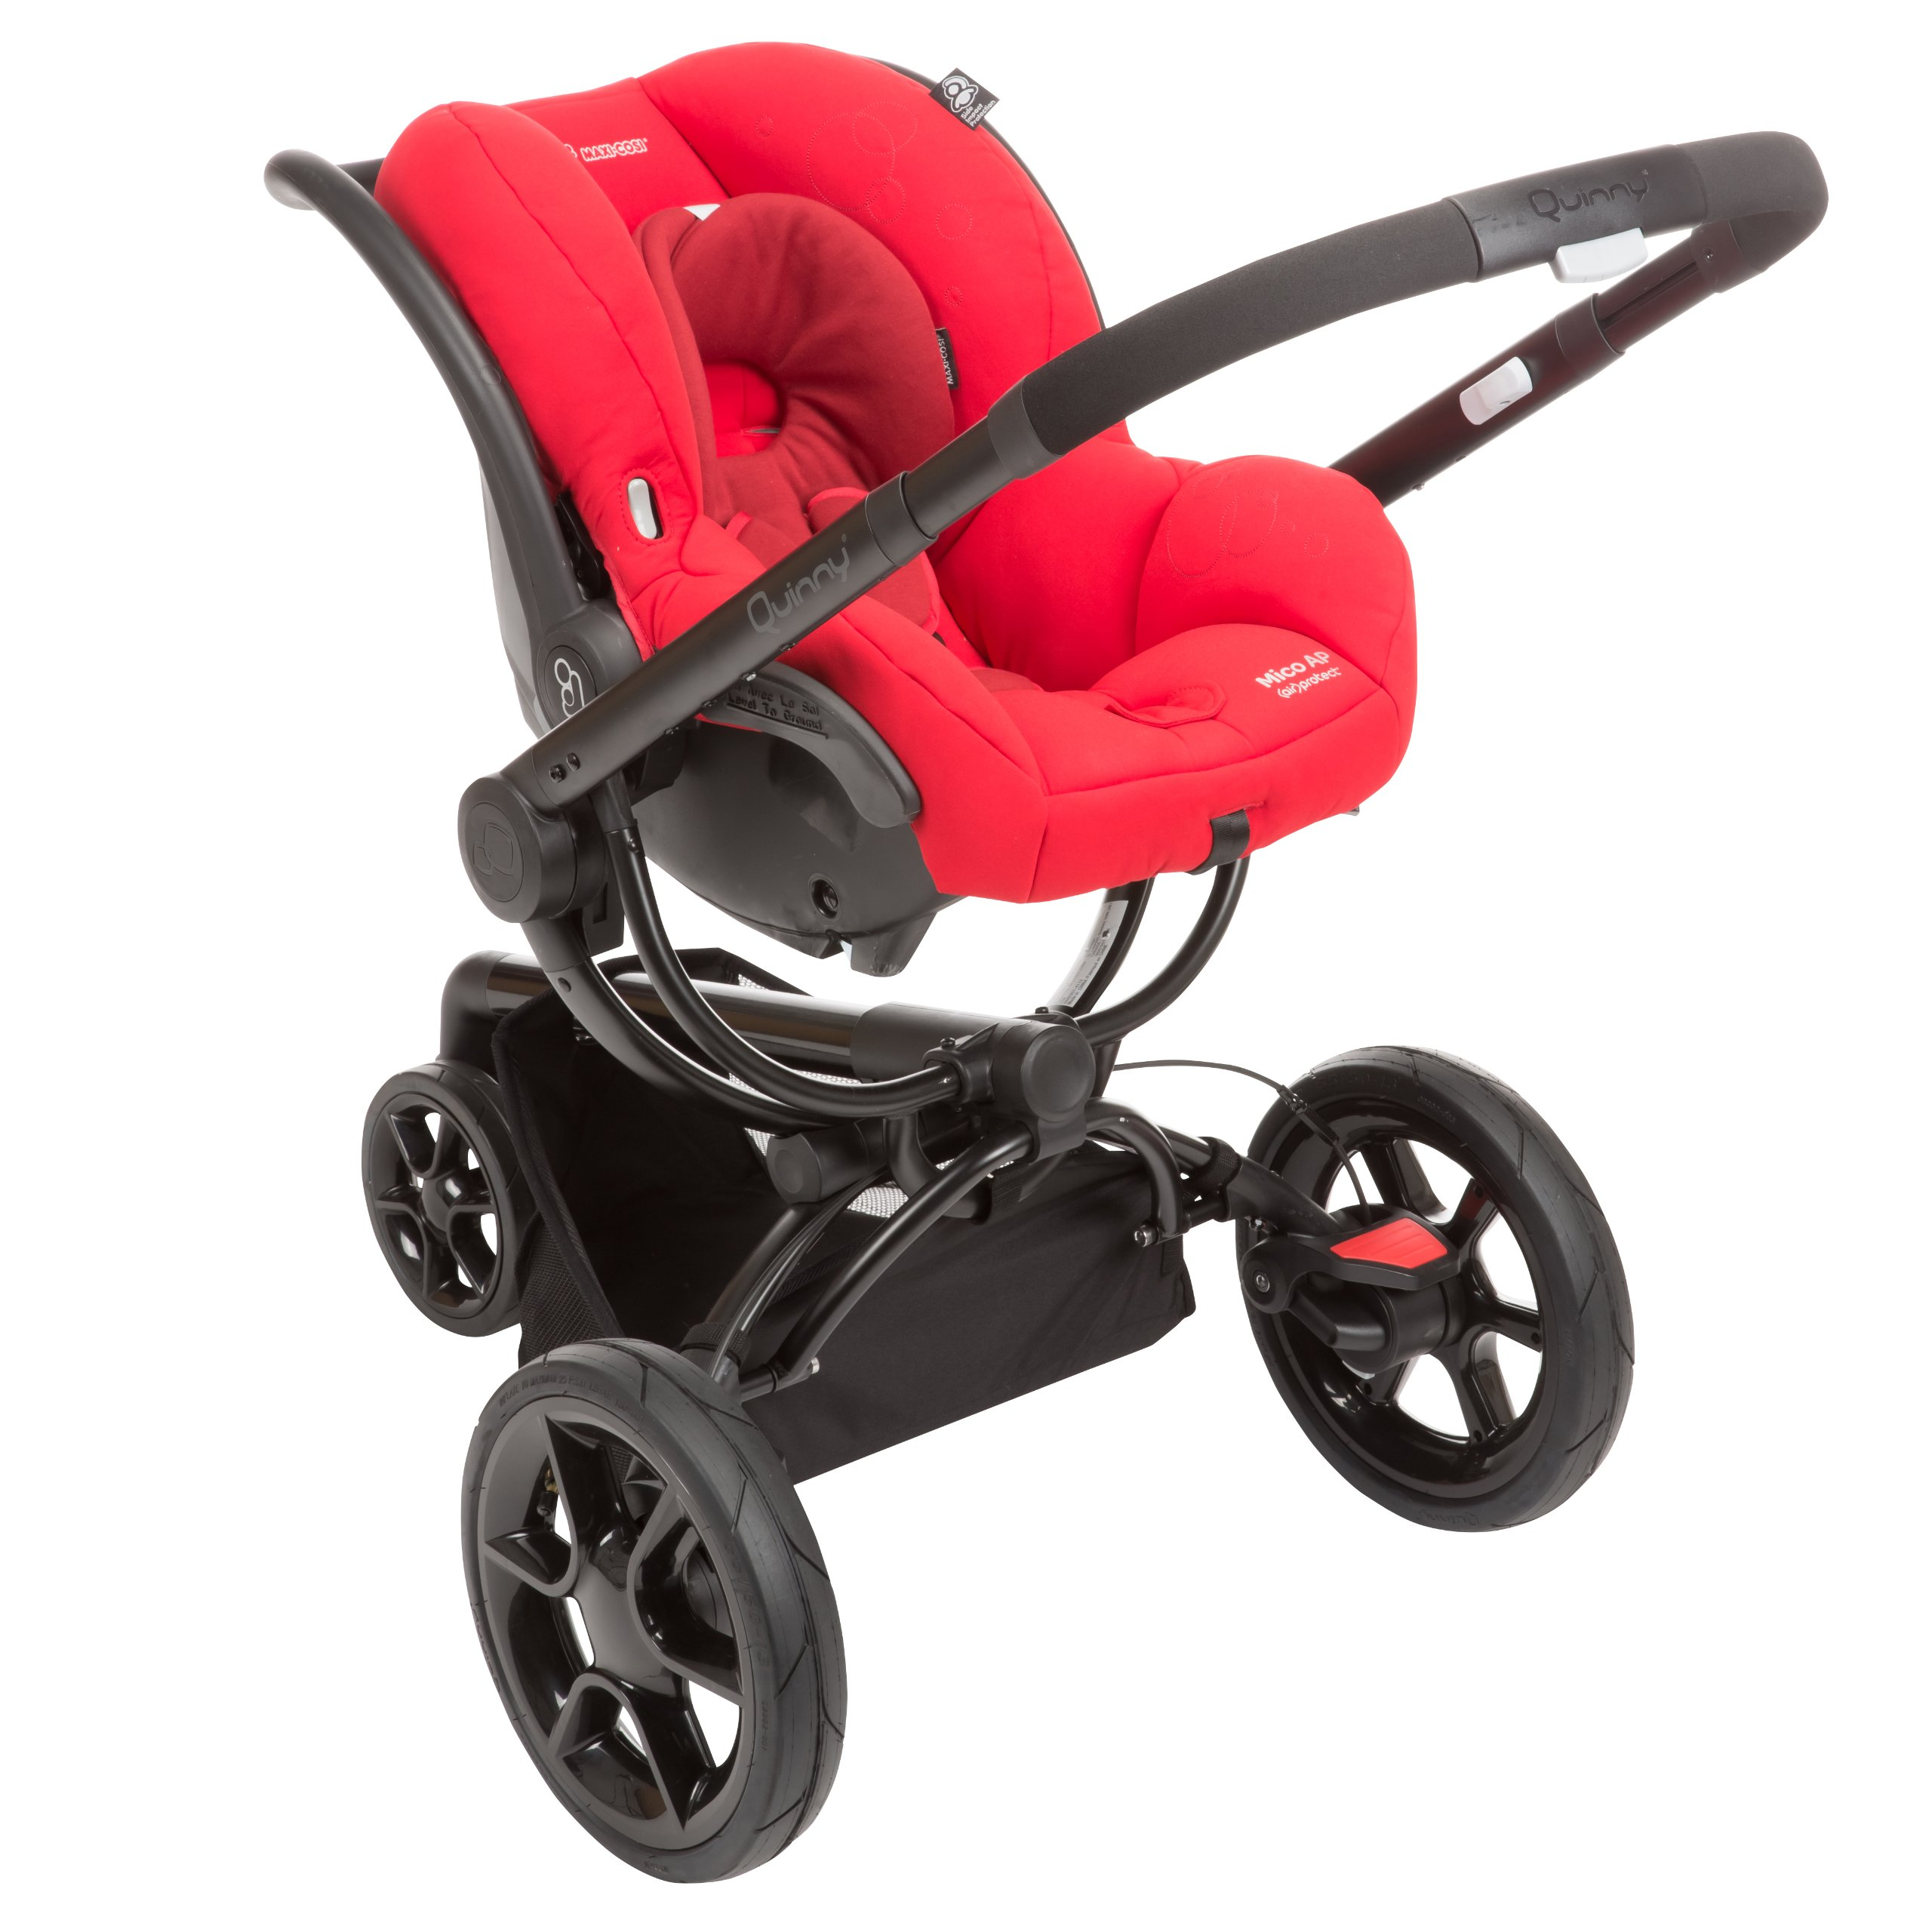 Maxi-Cosi Mico AP Infant Car Seat - Red by Maxi-Cosi (Image #3)